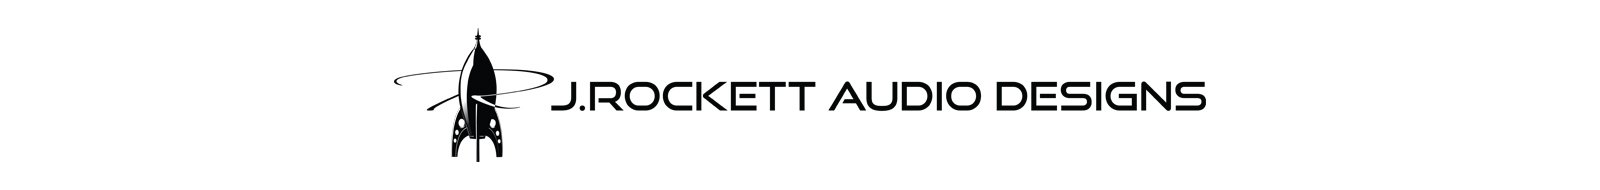 J. Rockett Audio Designs Effects Pedals